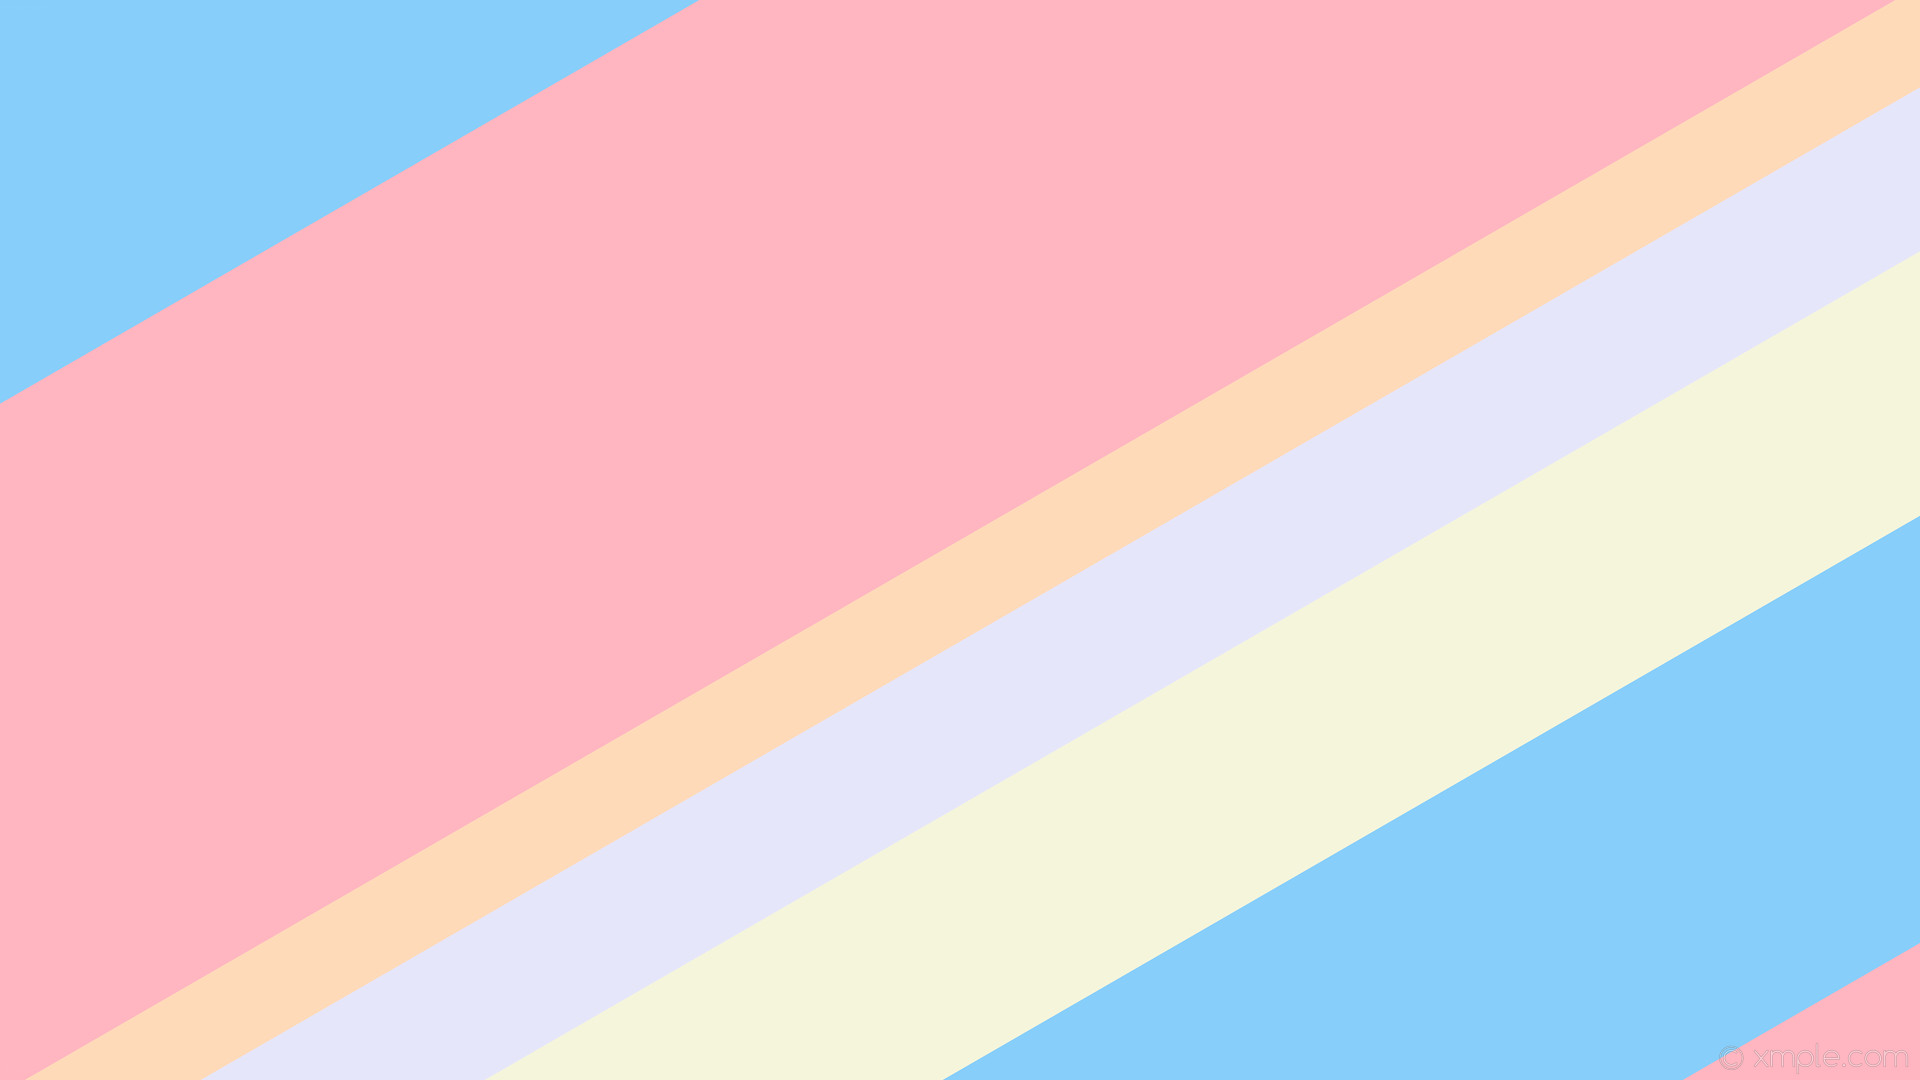 wallpaper streaks lines purple yellow stripes blue white pink peach puff  lavender beige light sky blue